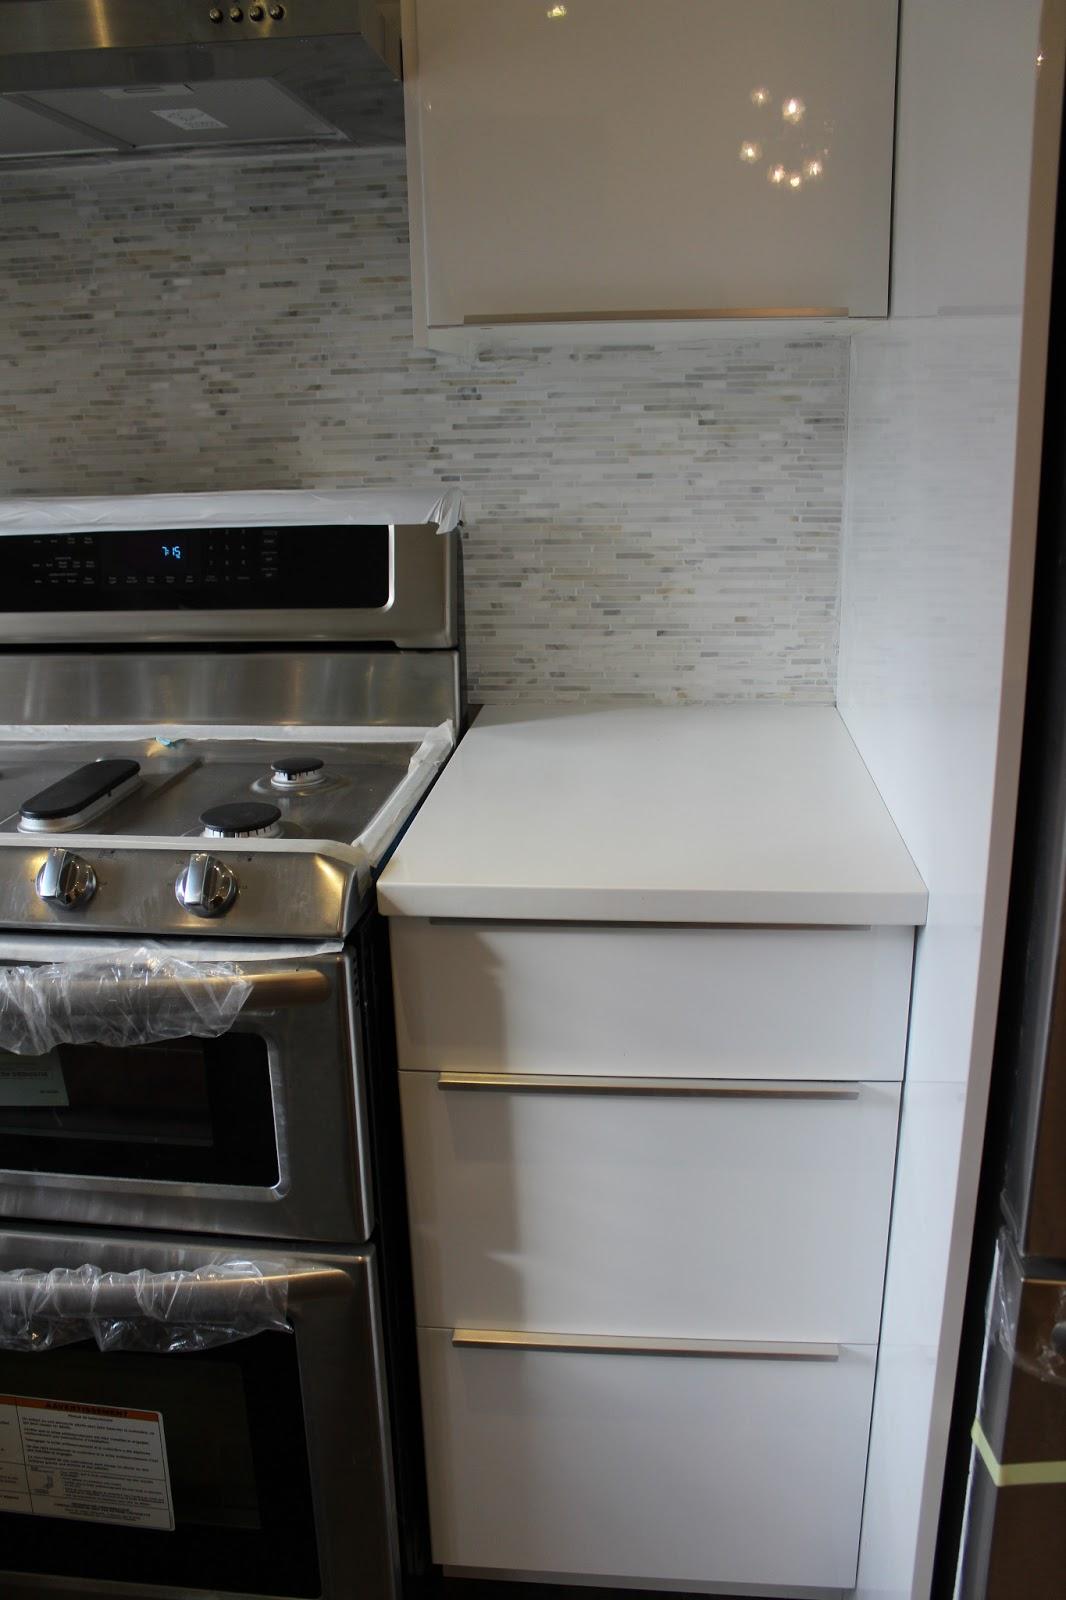 pretty swanky digs ikea abstrakt white high gloss kitchen in progress. Black Bedroom Furniture Sets. Home Design Ideas